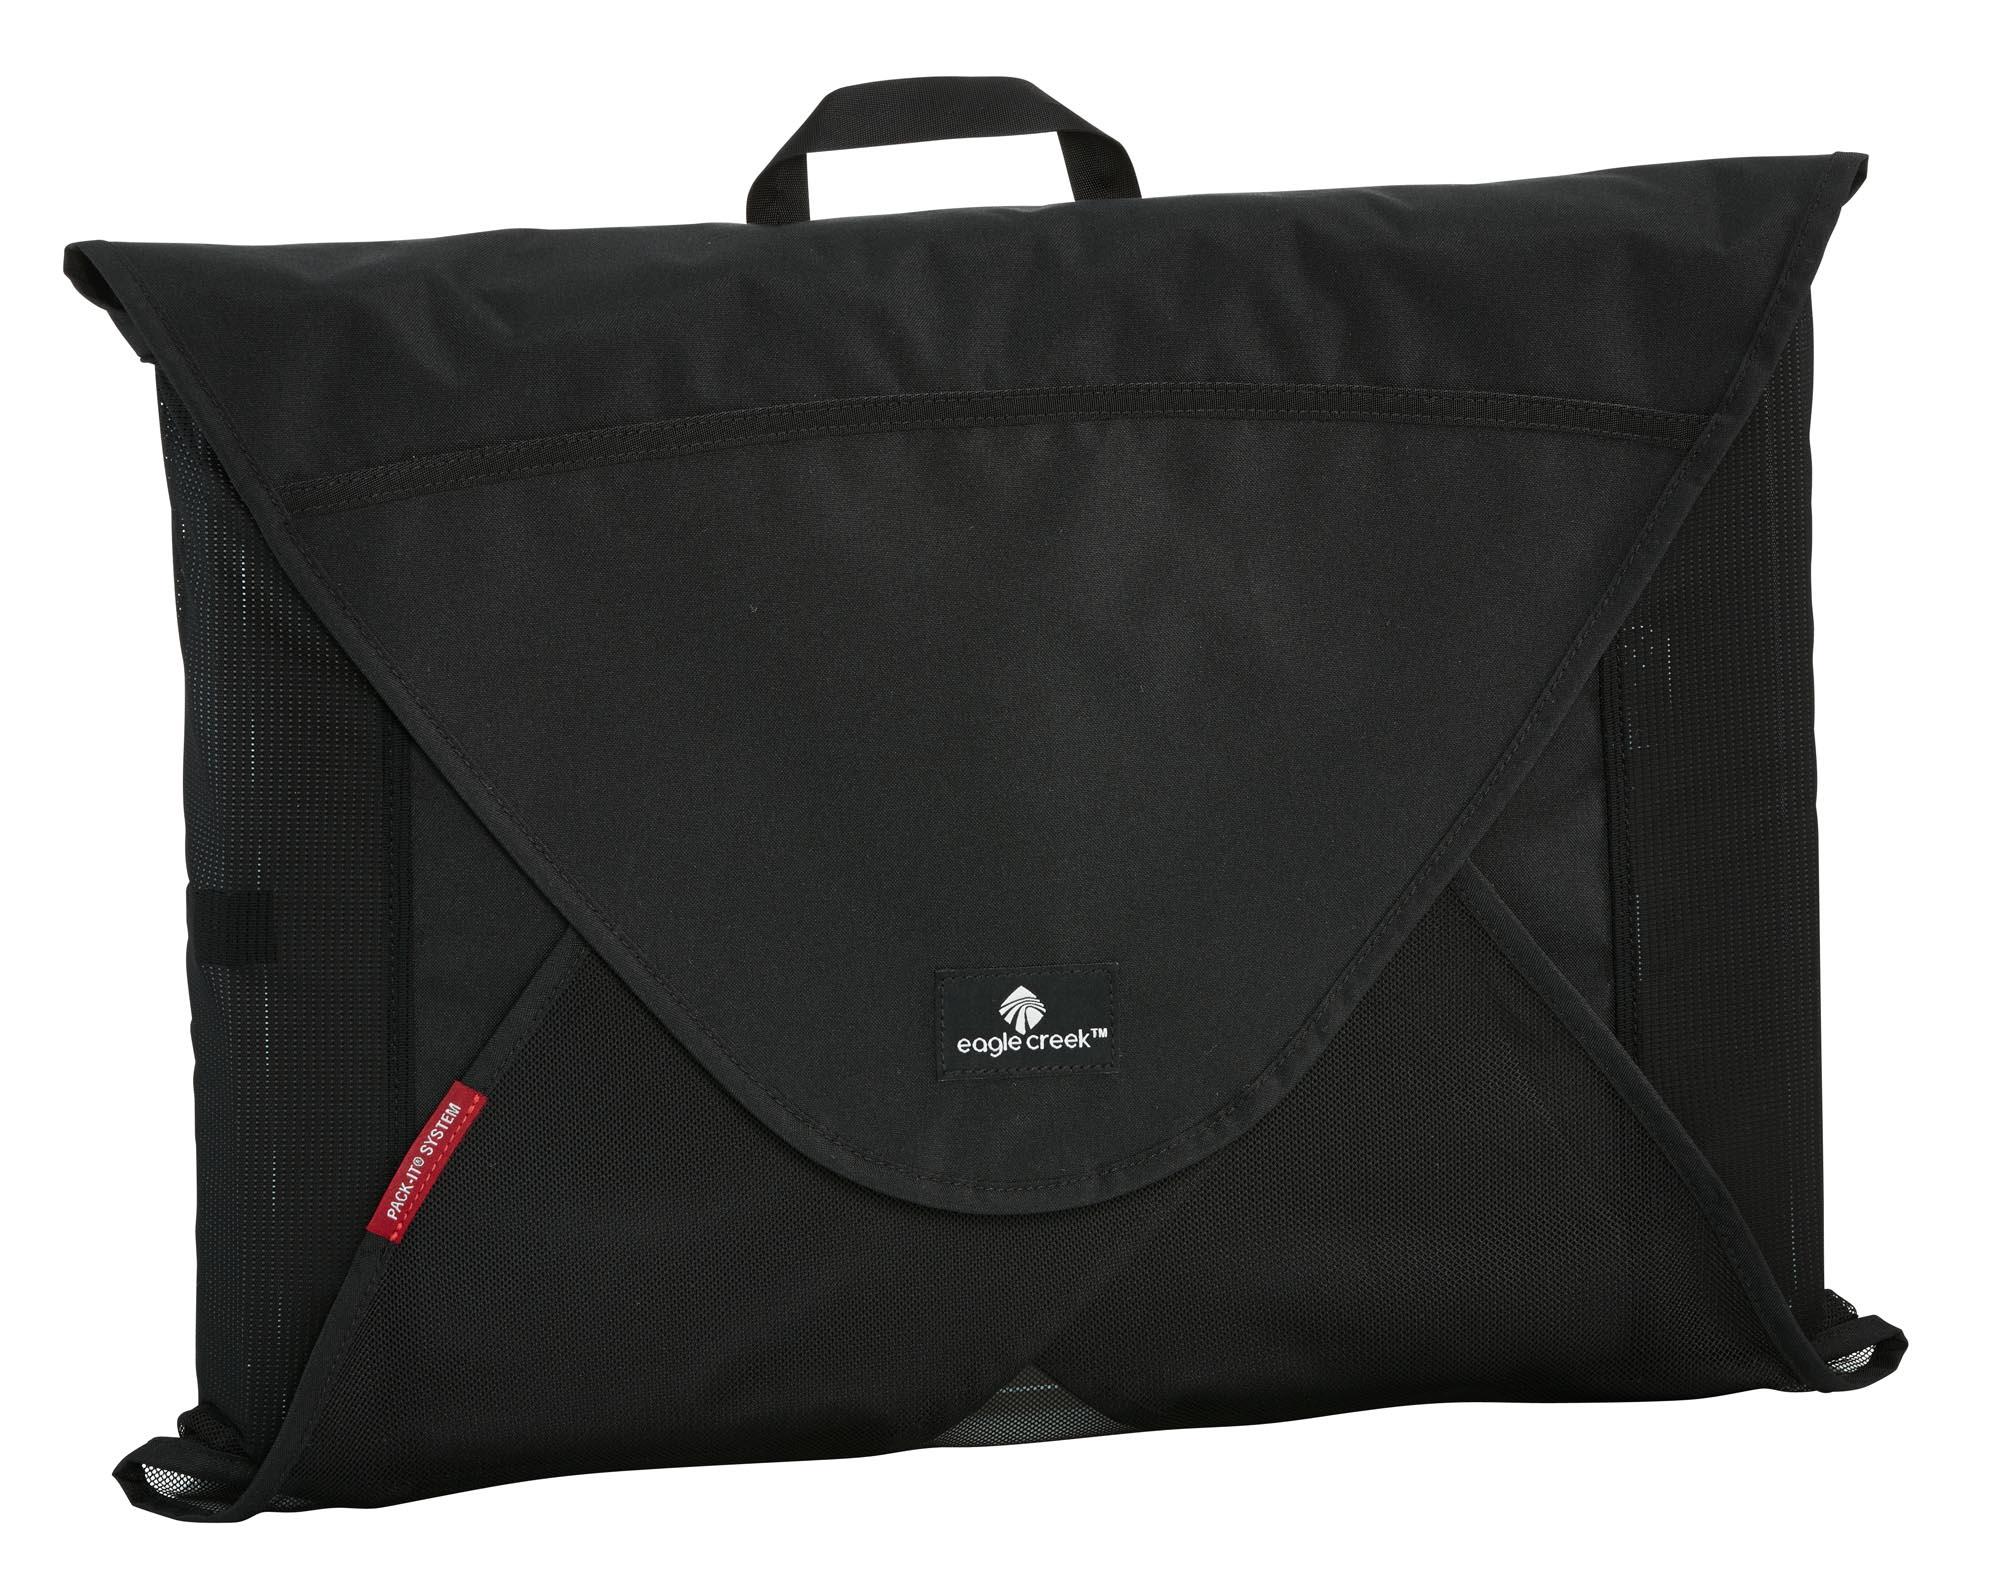 EagleCreek - Pack-It Garment Folder Large Black - Packing Bags -